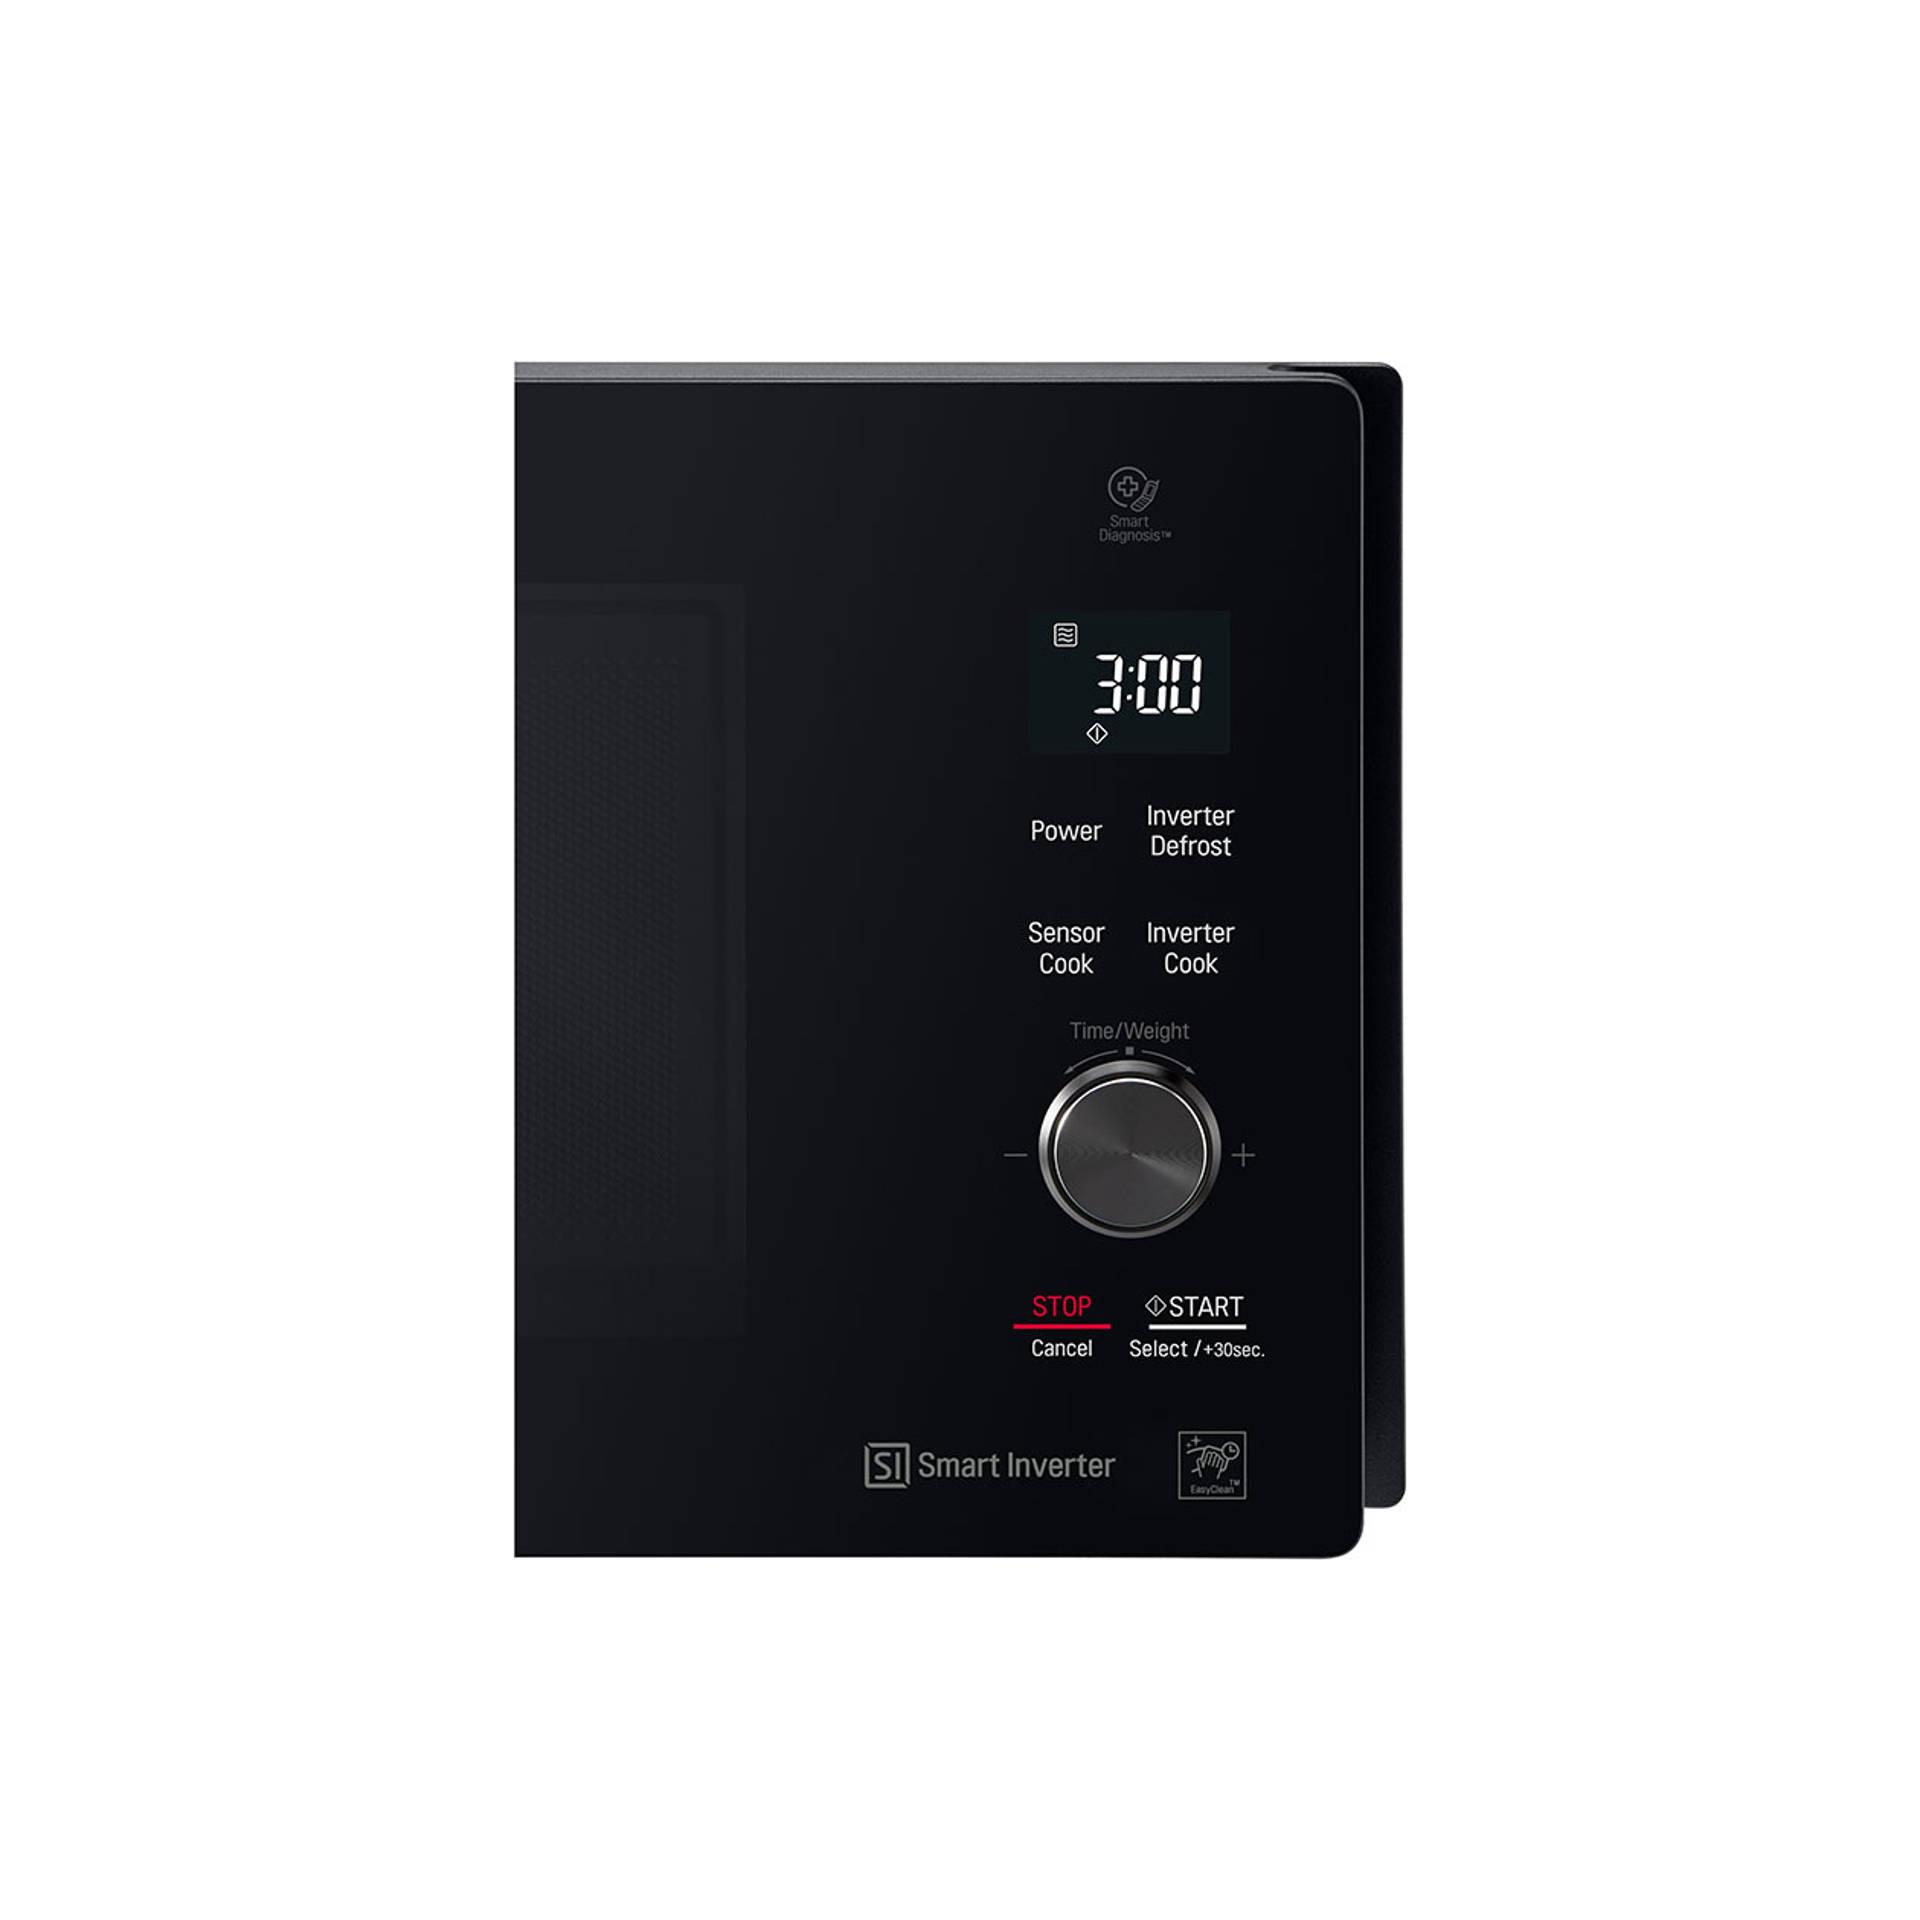 LG 42L NeoChef Microwave Black - MH8265DIS (Photo: 2)